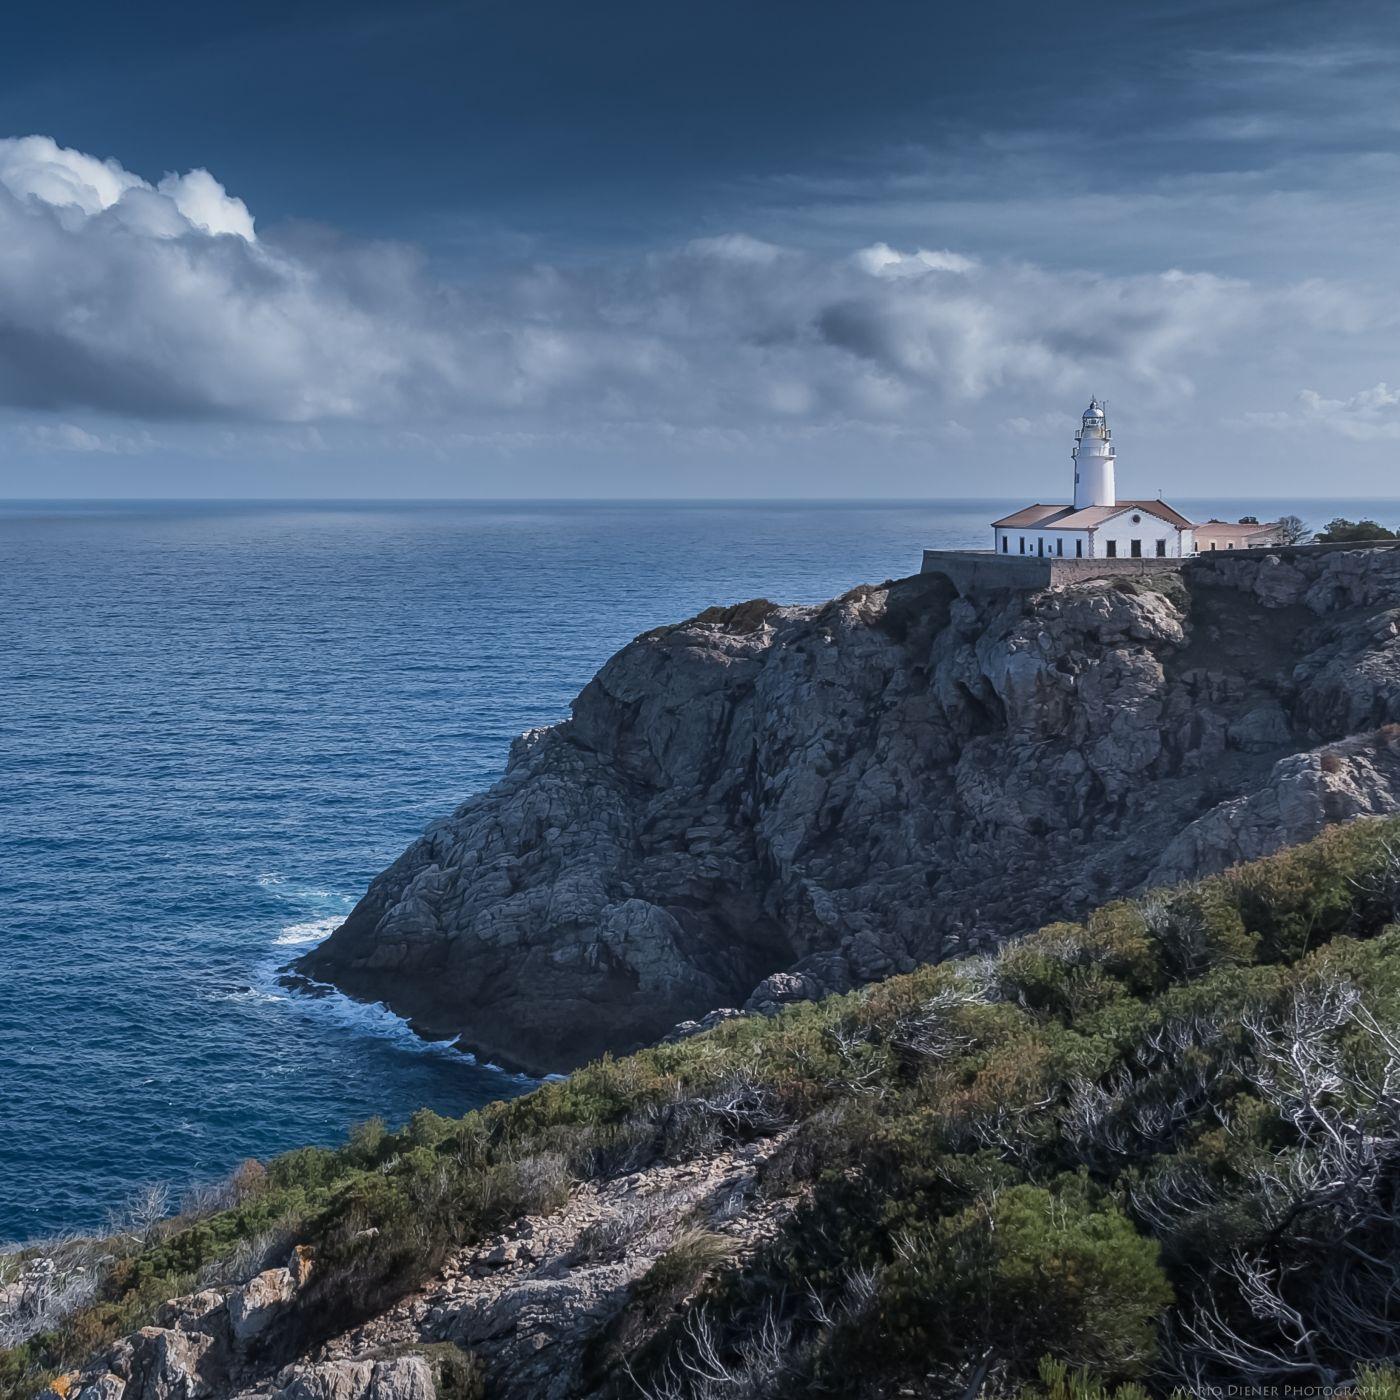 Faro de Capdepera, Spain